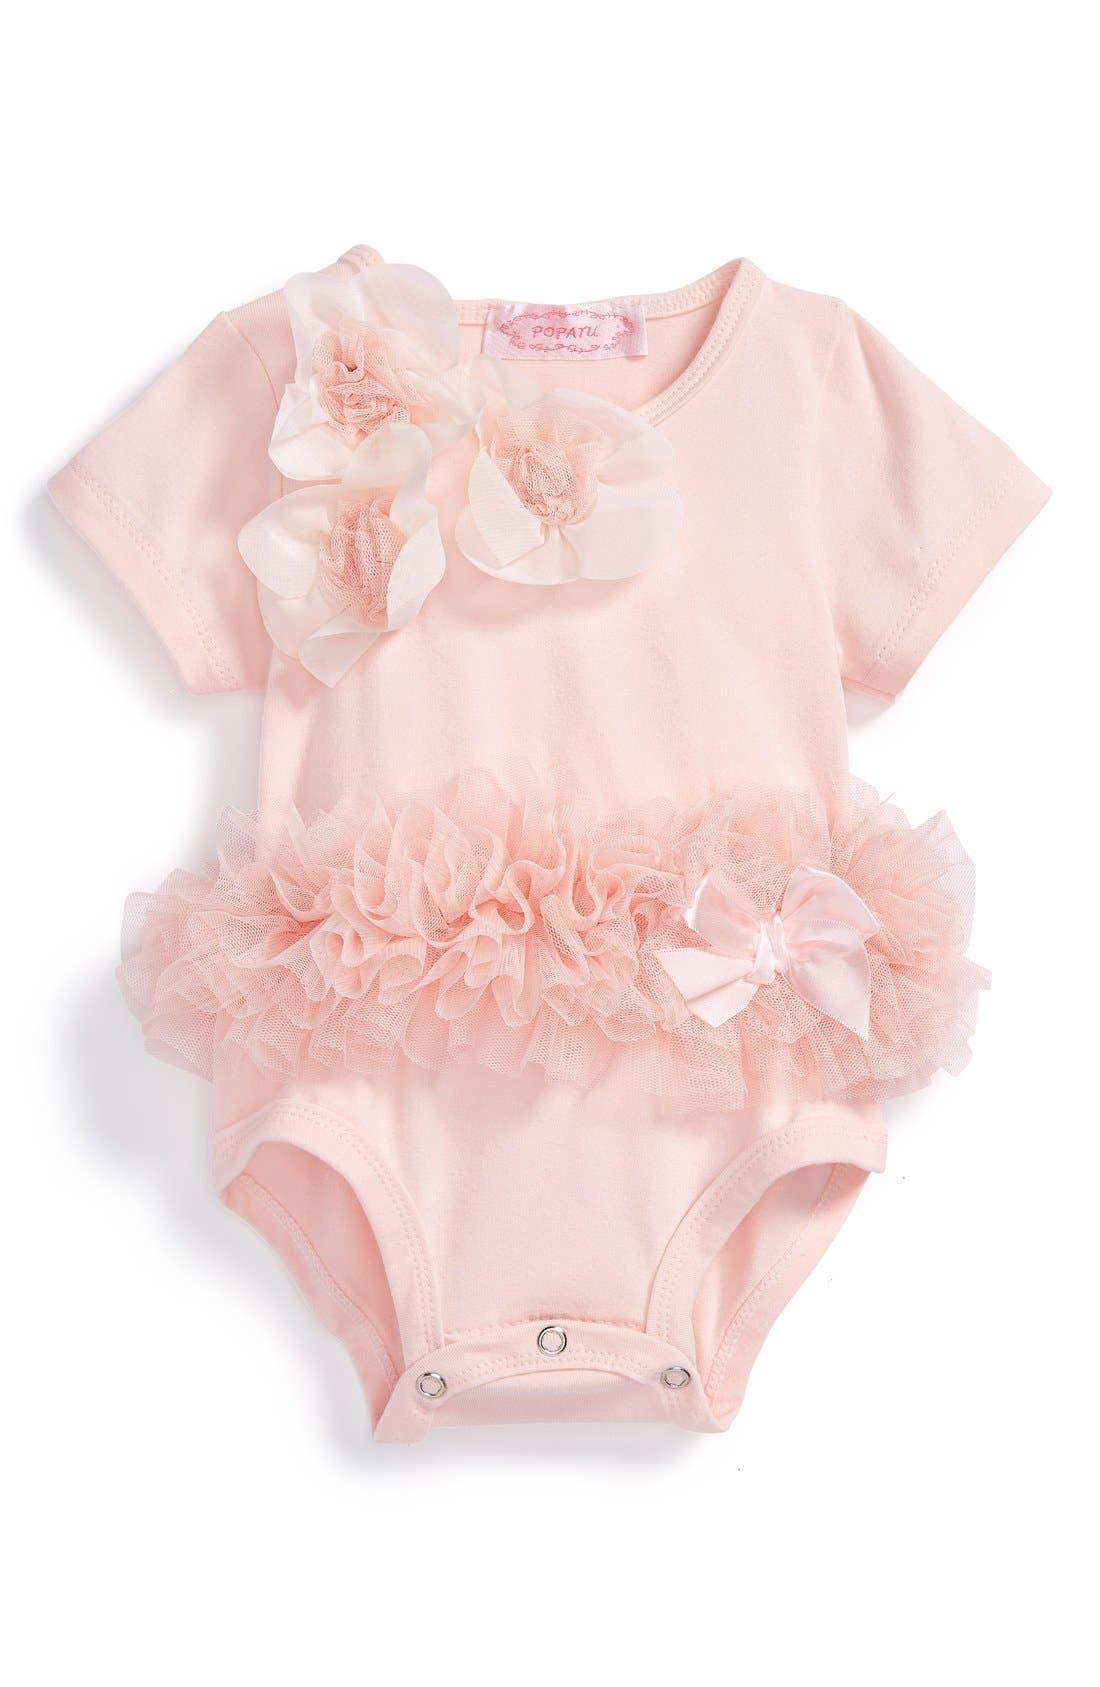 Main Image - Popatu Floral Tutu Bodysuit (Baby Girls)